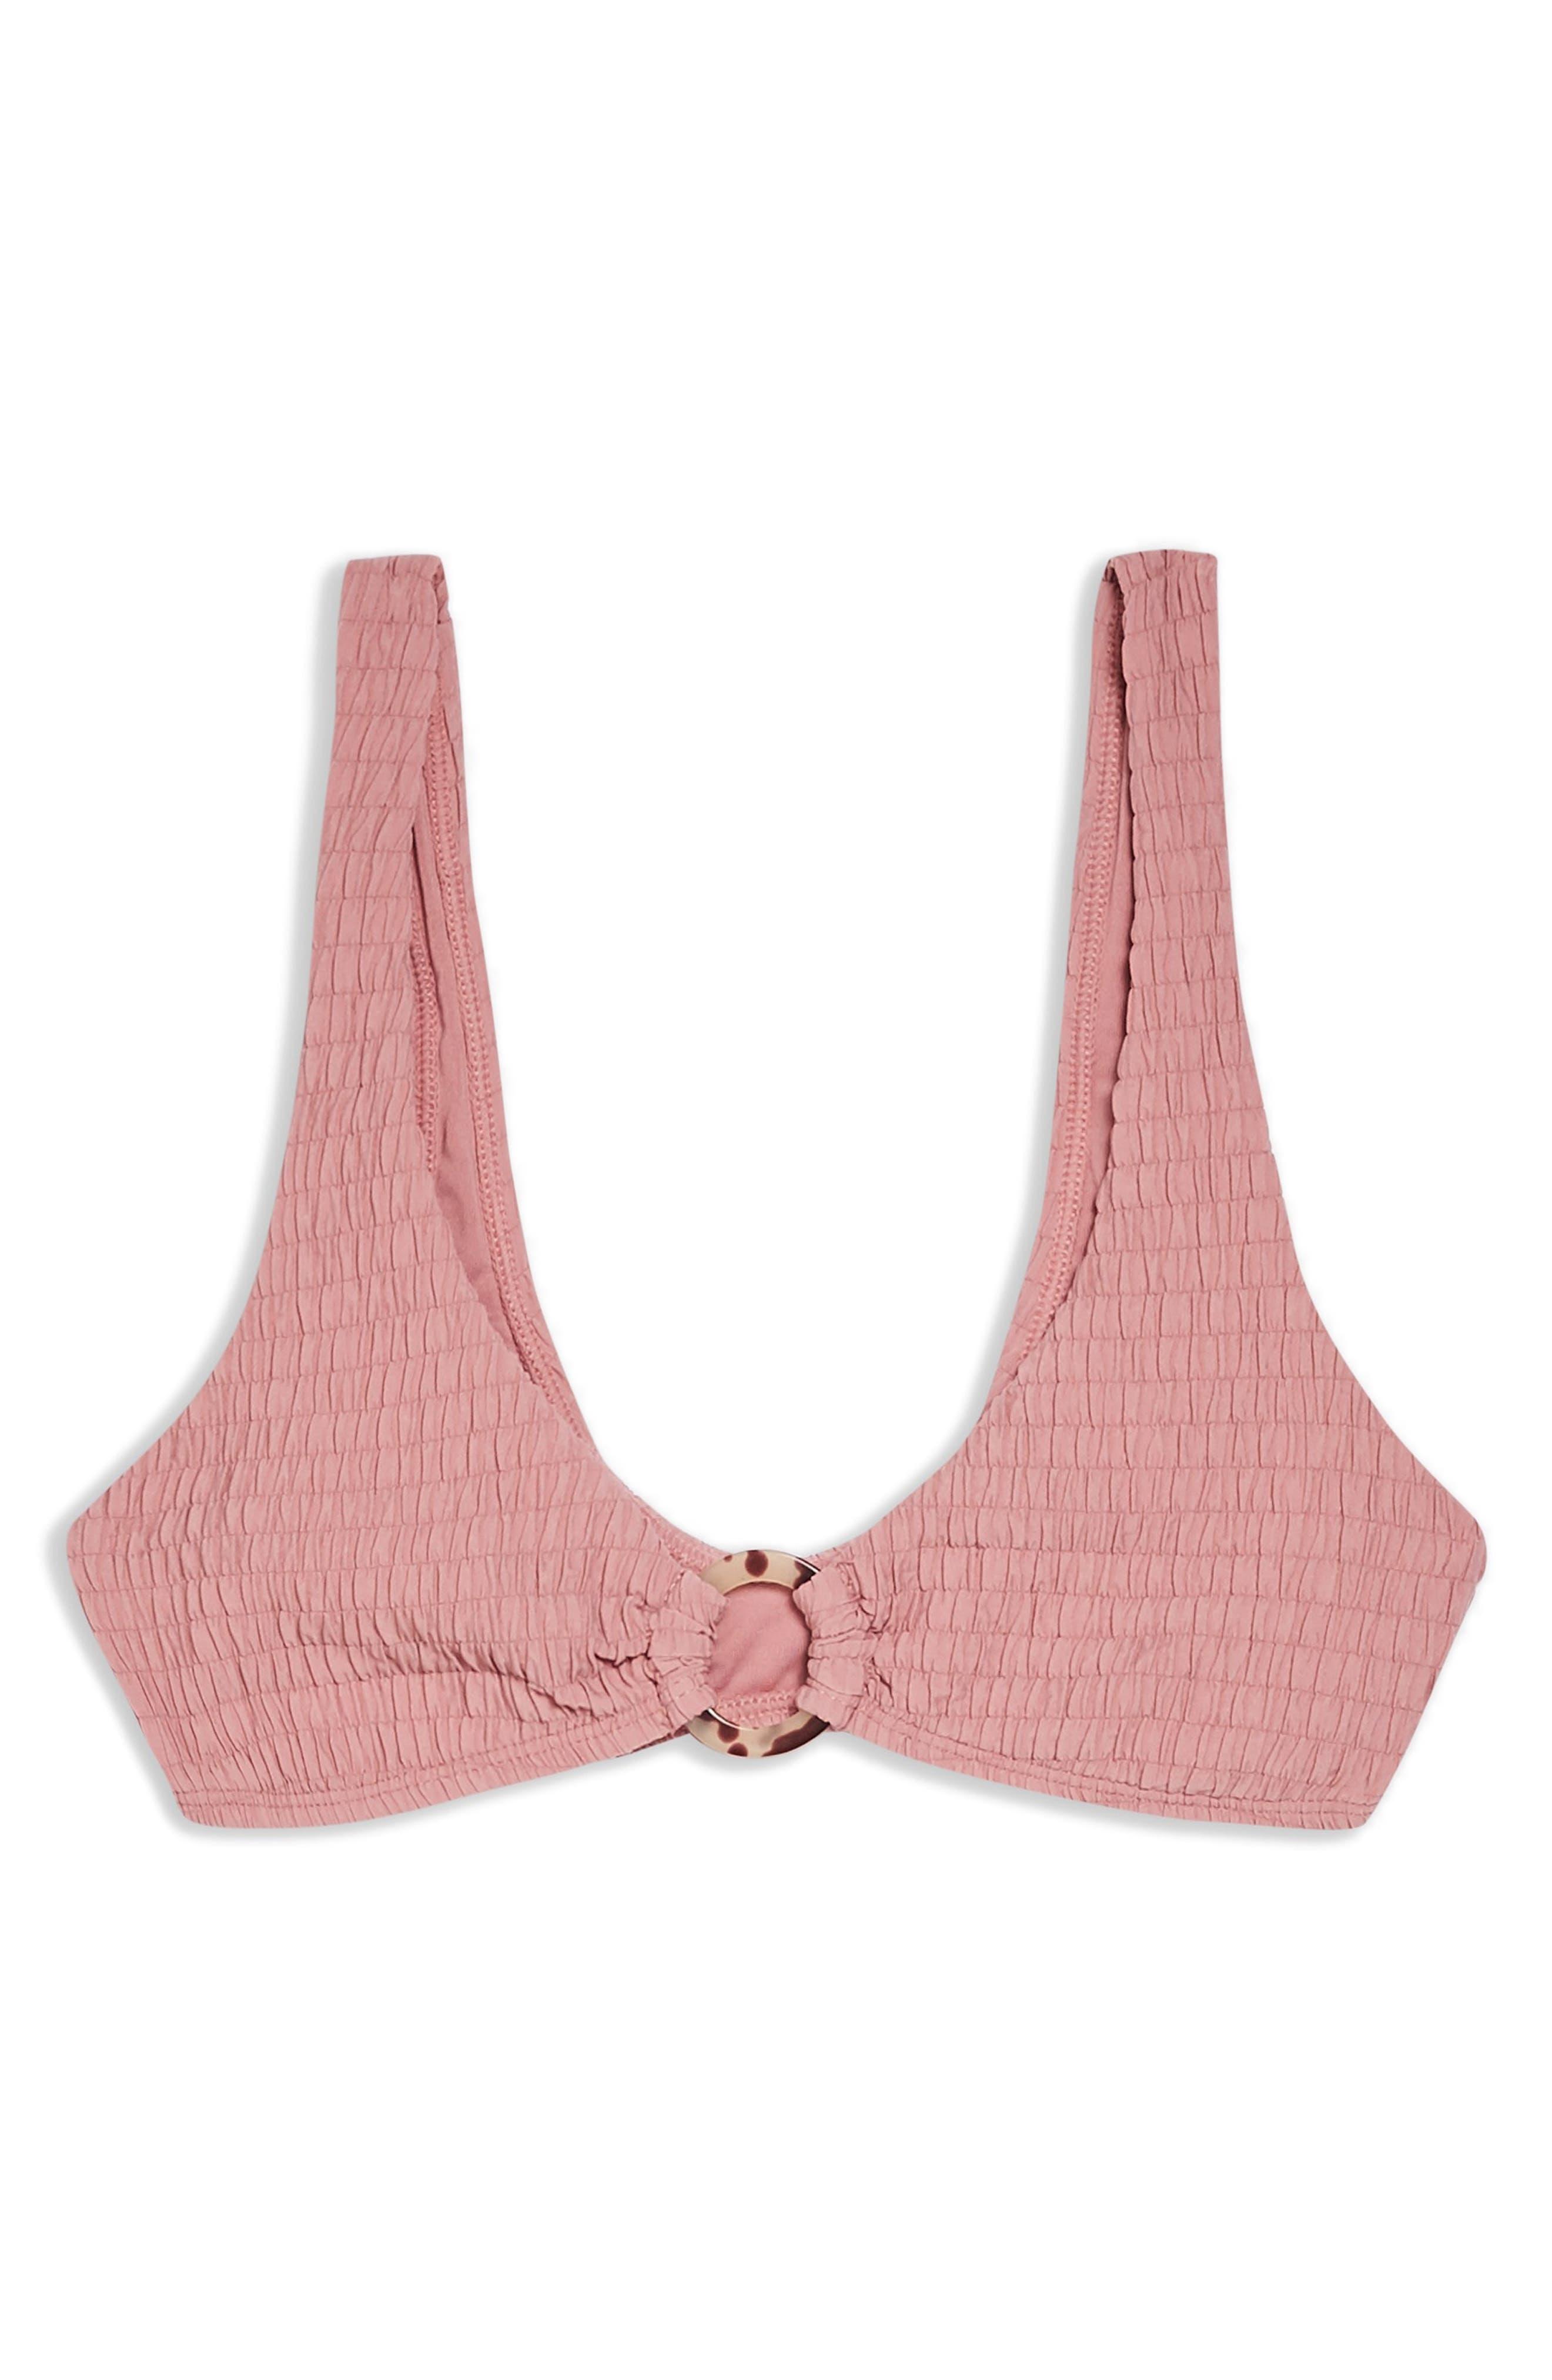 TOPSHOP, Tortoiseshell Ring Smocked Bikini Top, Alternate thumbnail 4, color, DUSTY PINK